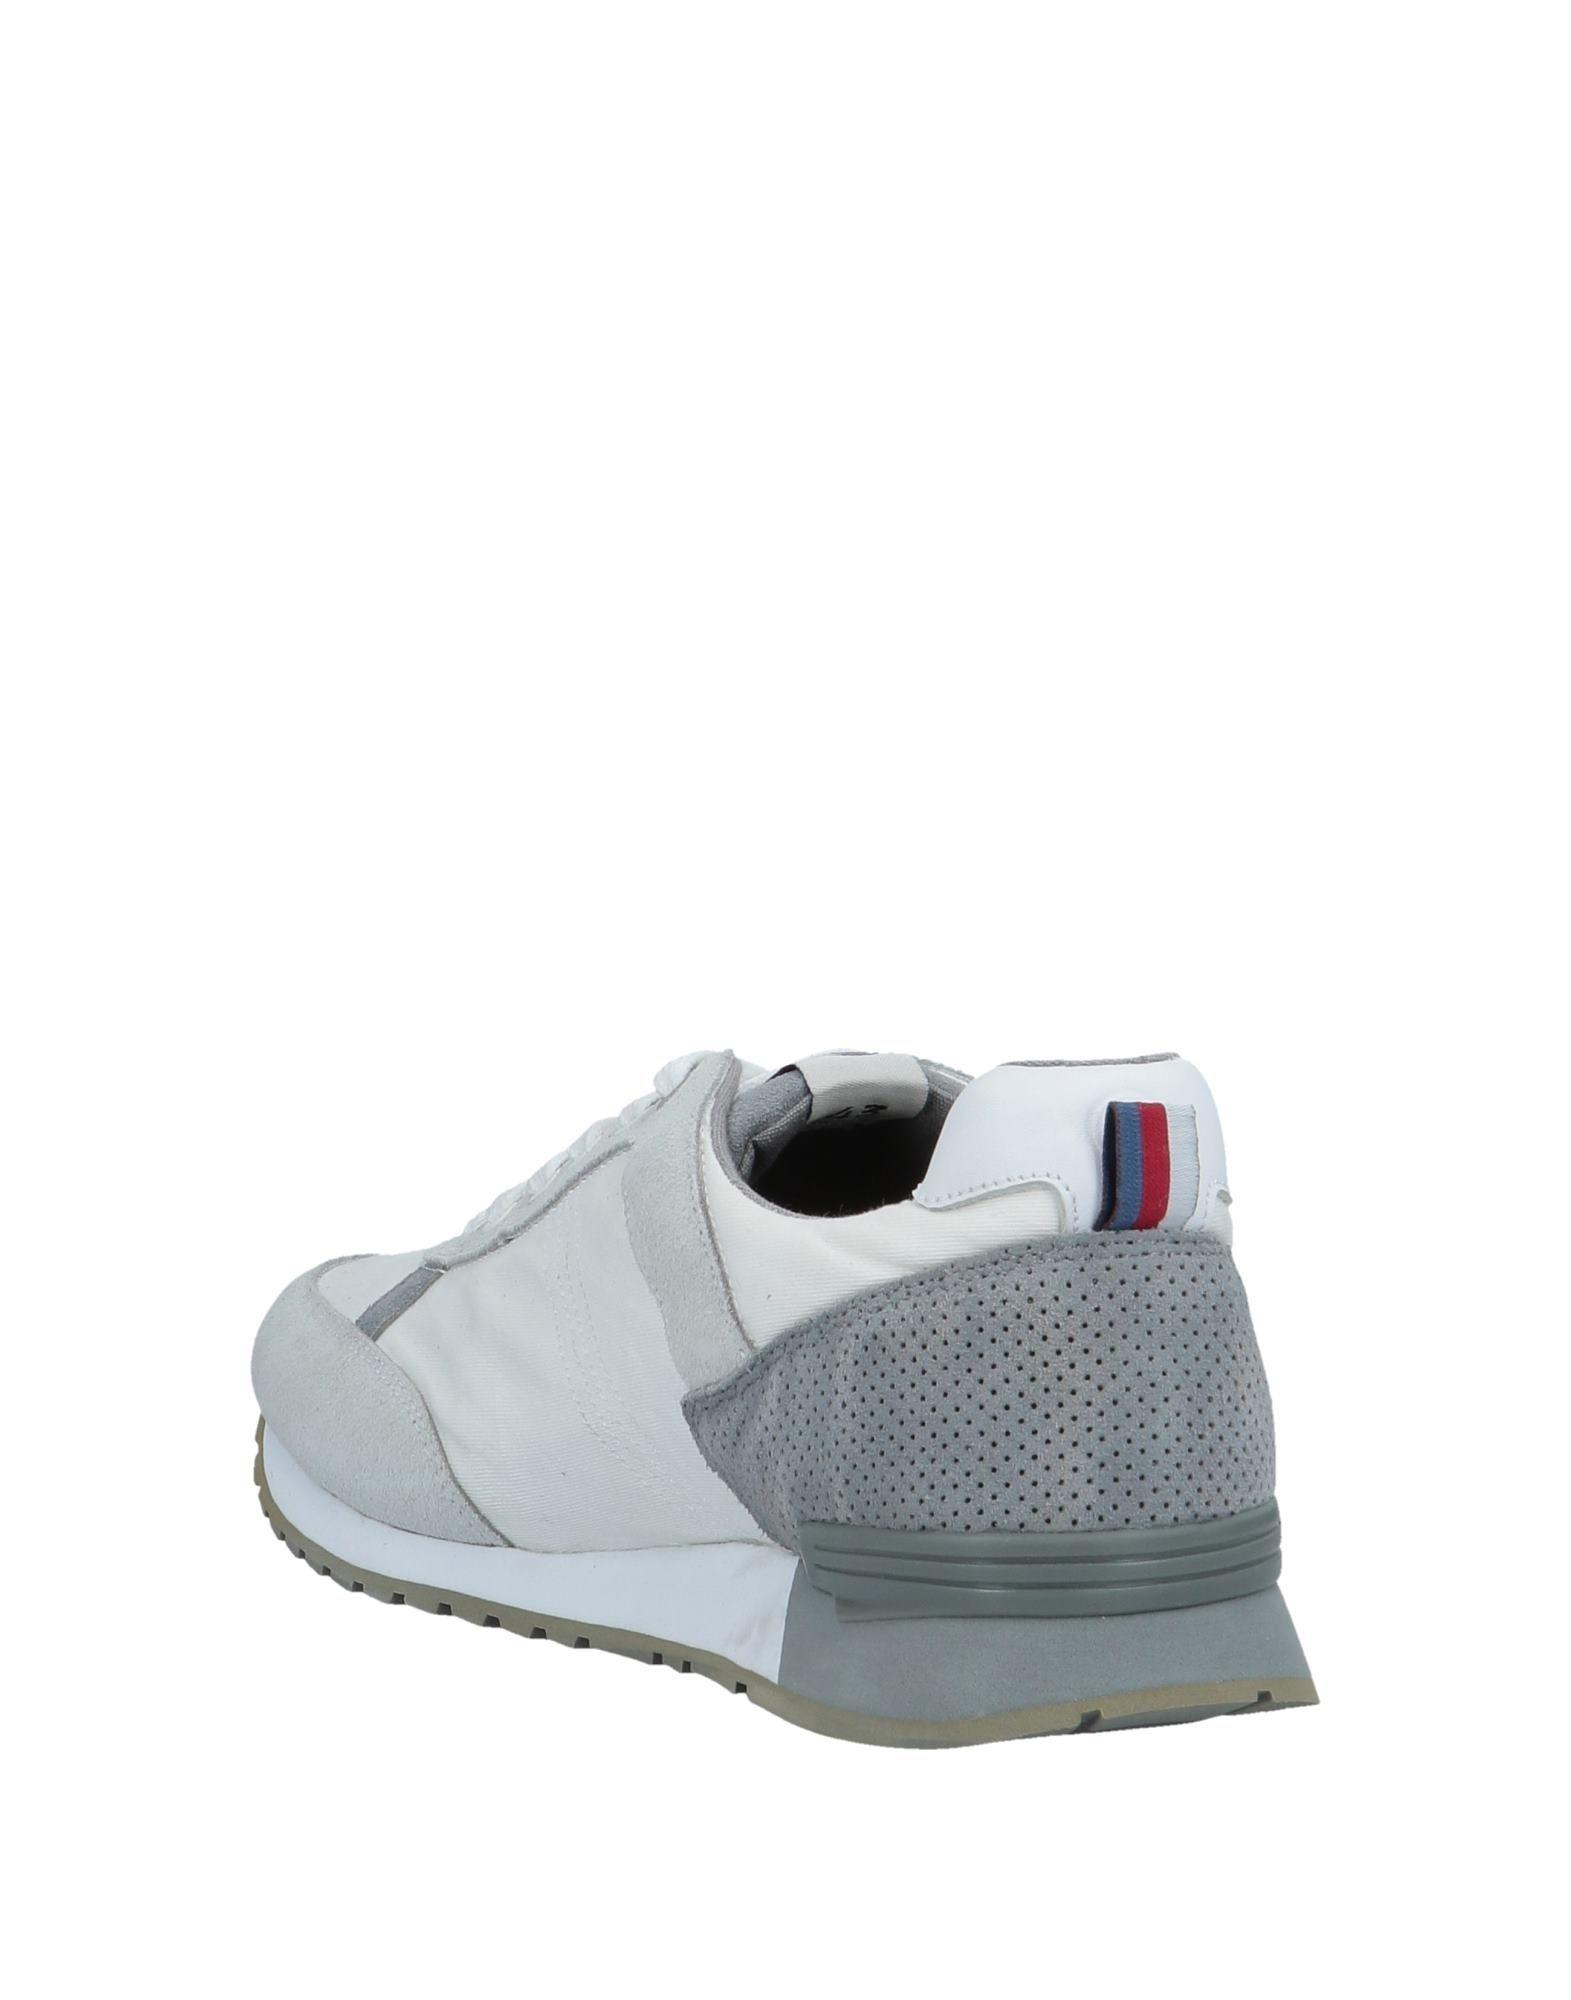 Rabatt echte Schuhe Colmar Sneakers 11435955PO Herren  11435955PO Sneakers fbdf78